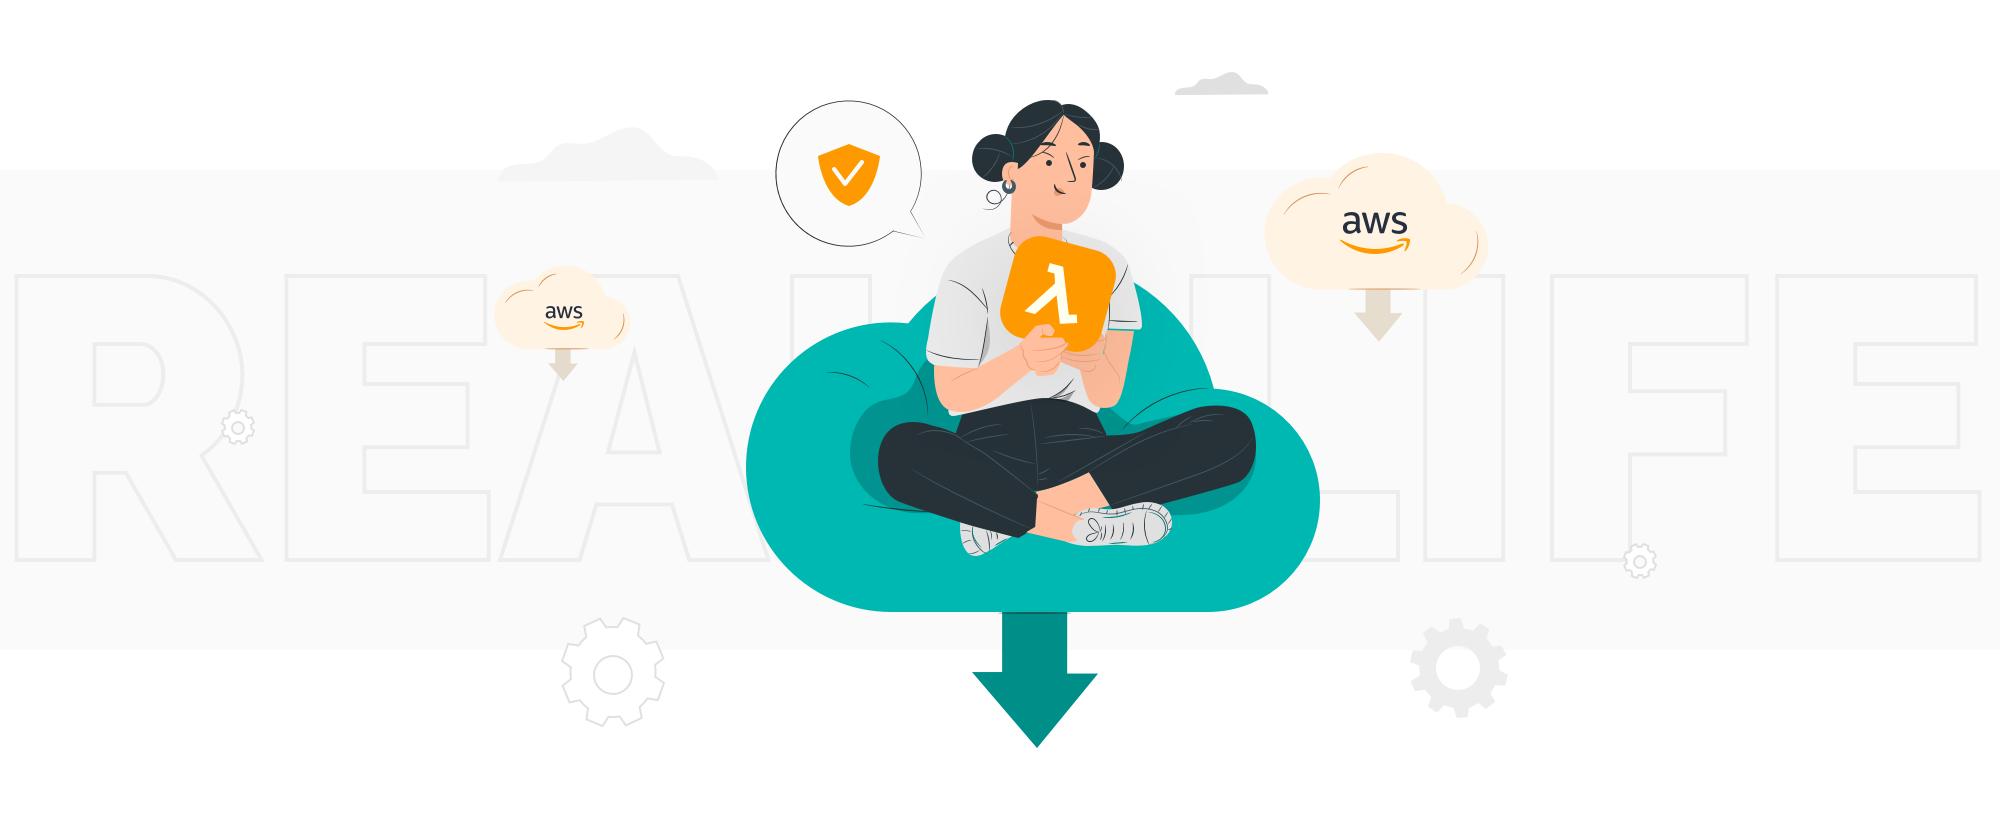 Optimize AWS Lambda performance in multiple ways   TechMagic.co